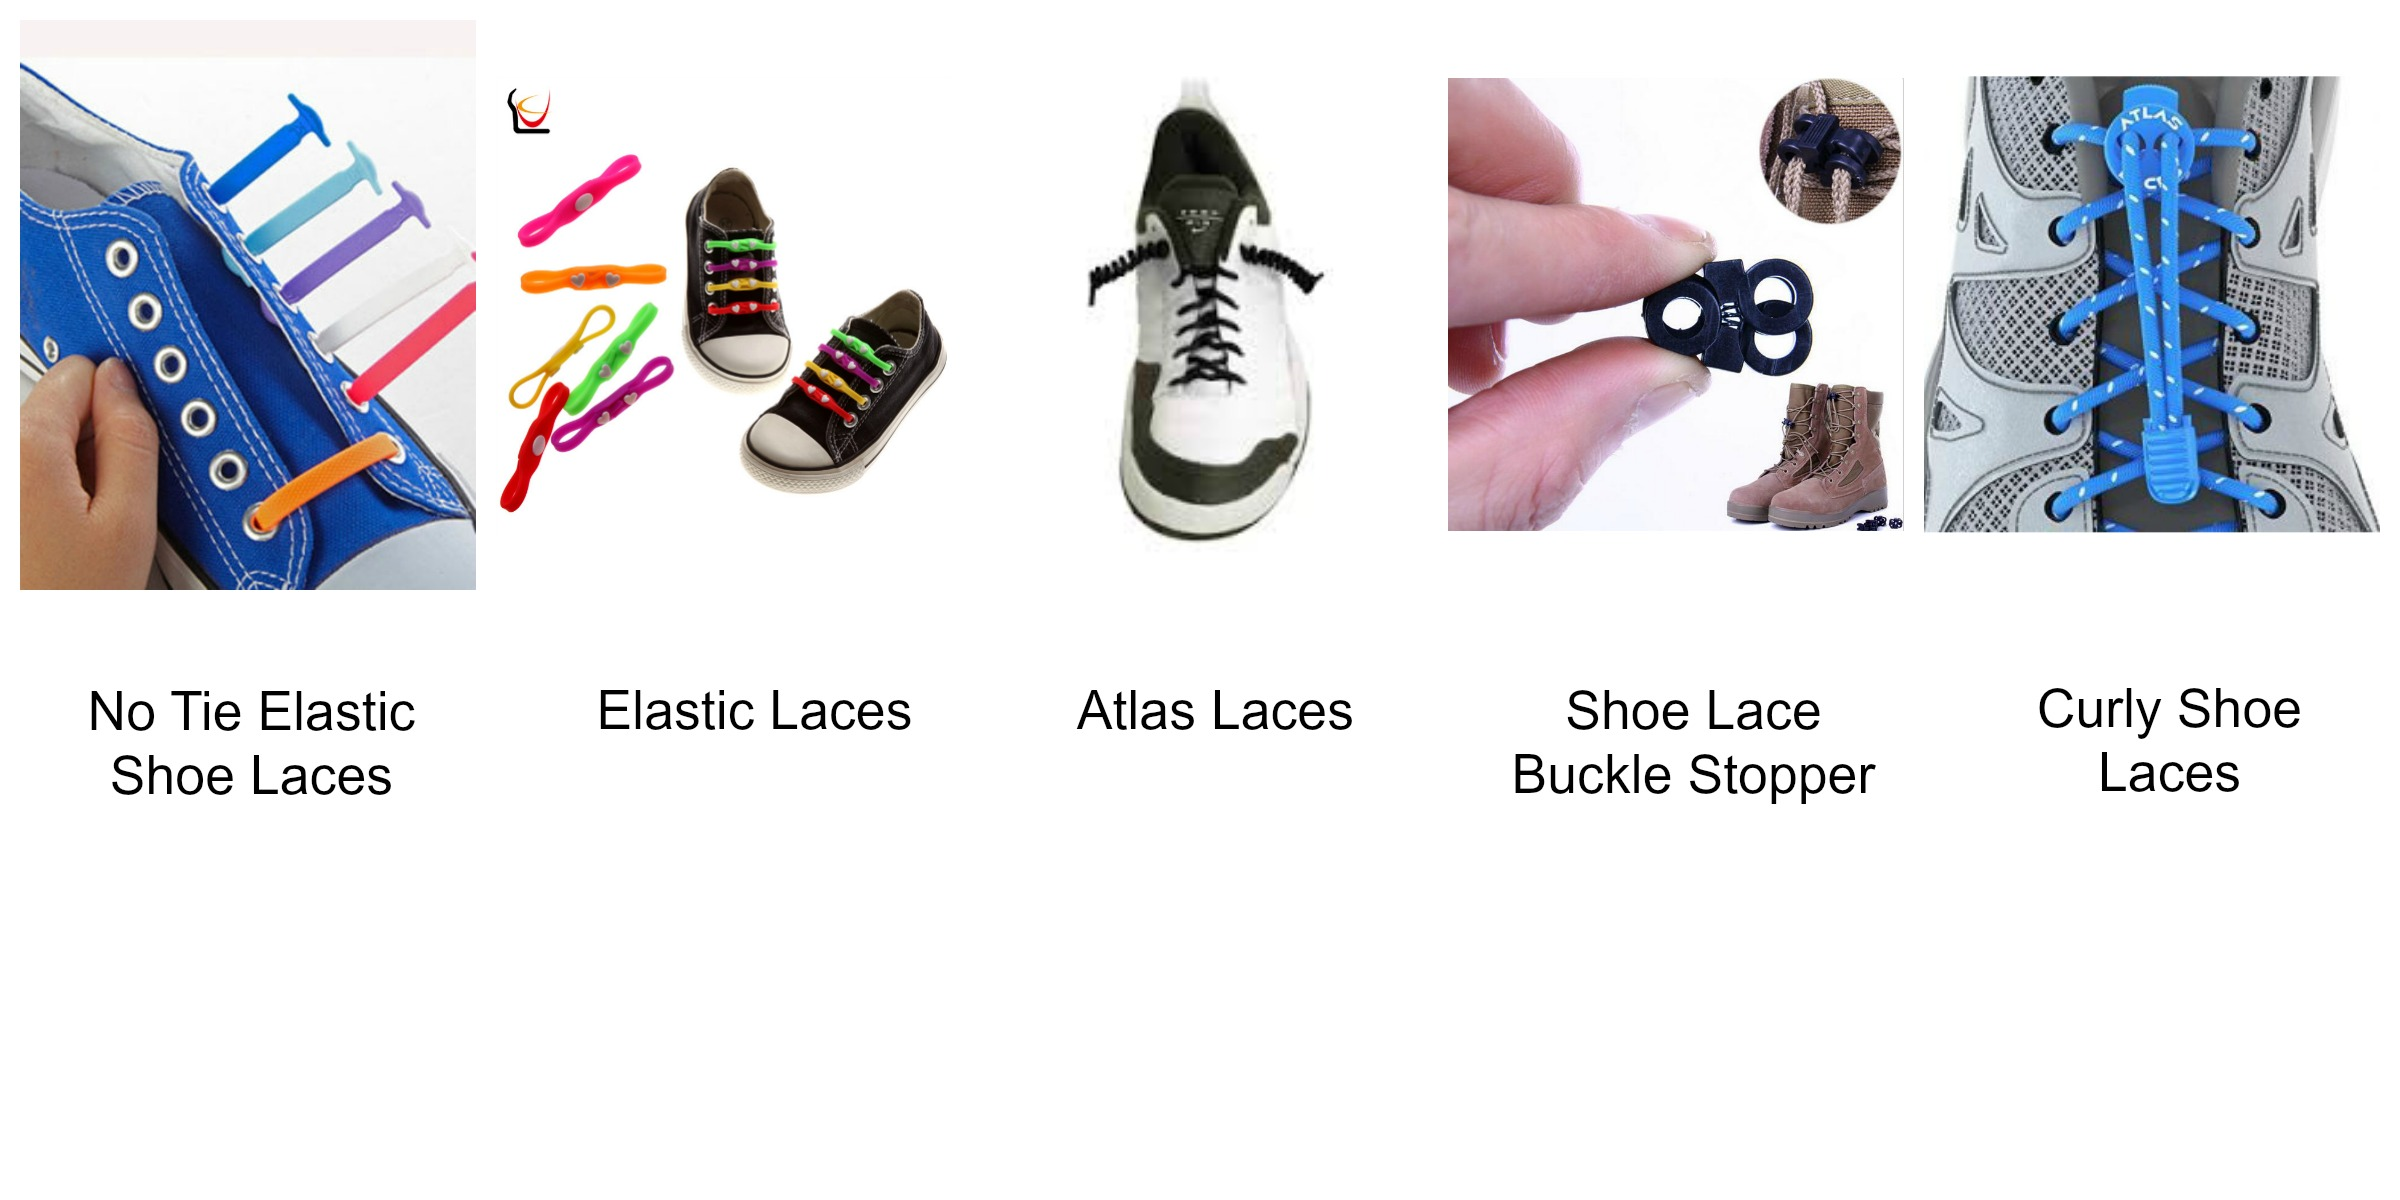 Shoelace Tying Alternative Strategies